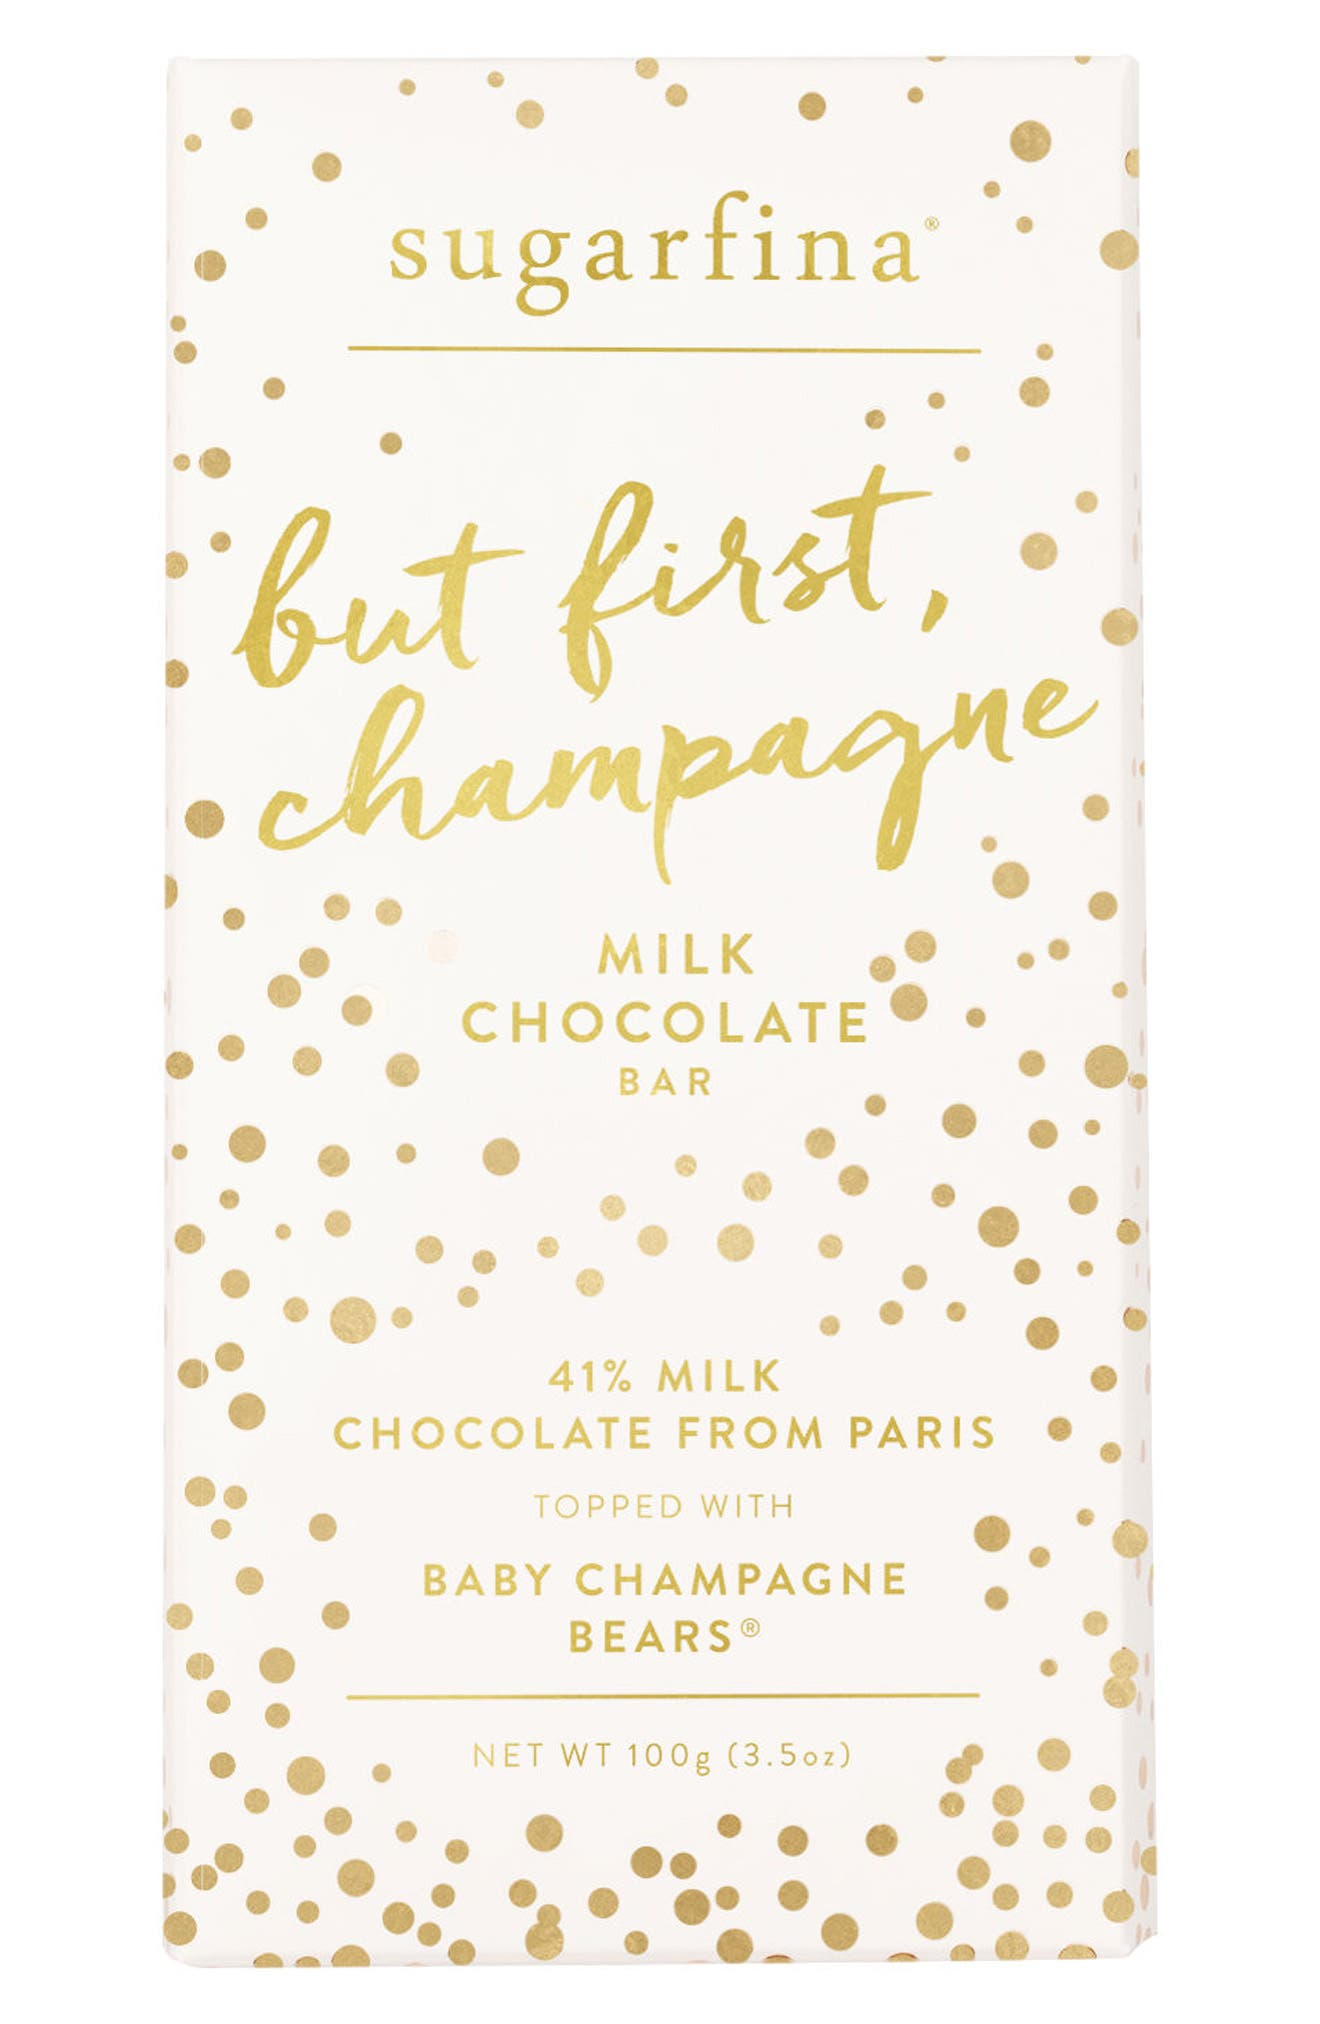 sugarfina 2-Pack Milk Chocolate Champagne Bears Bars